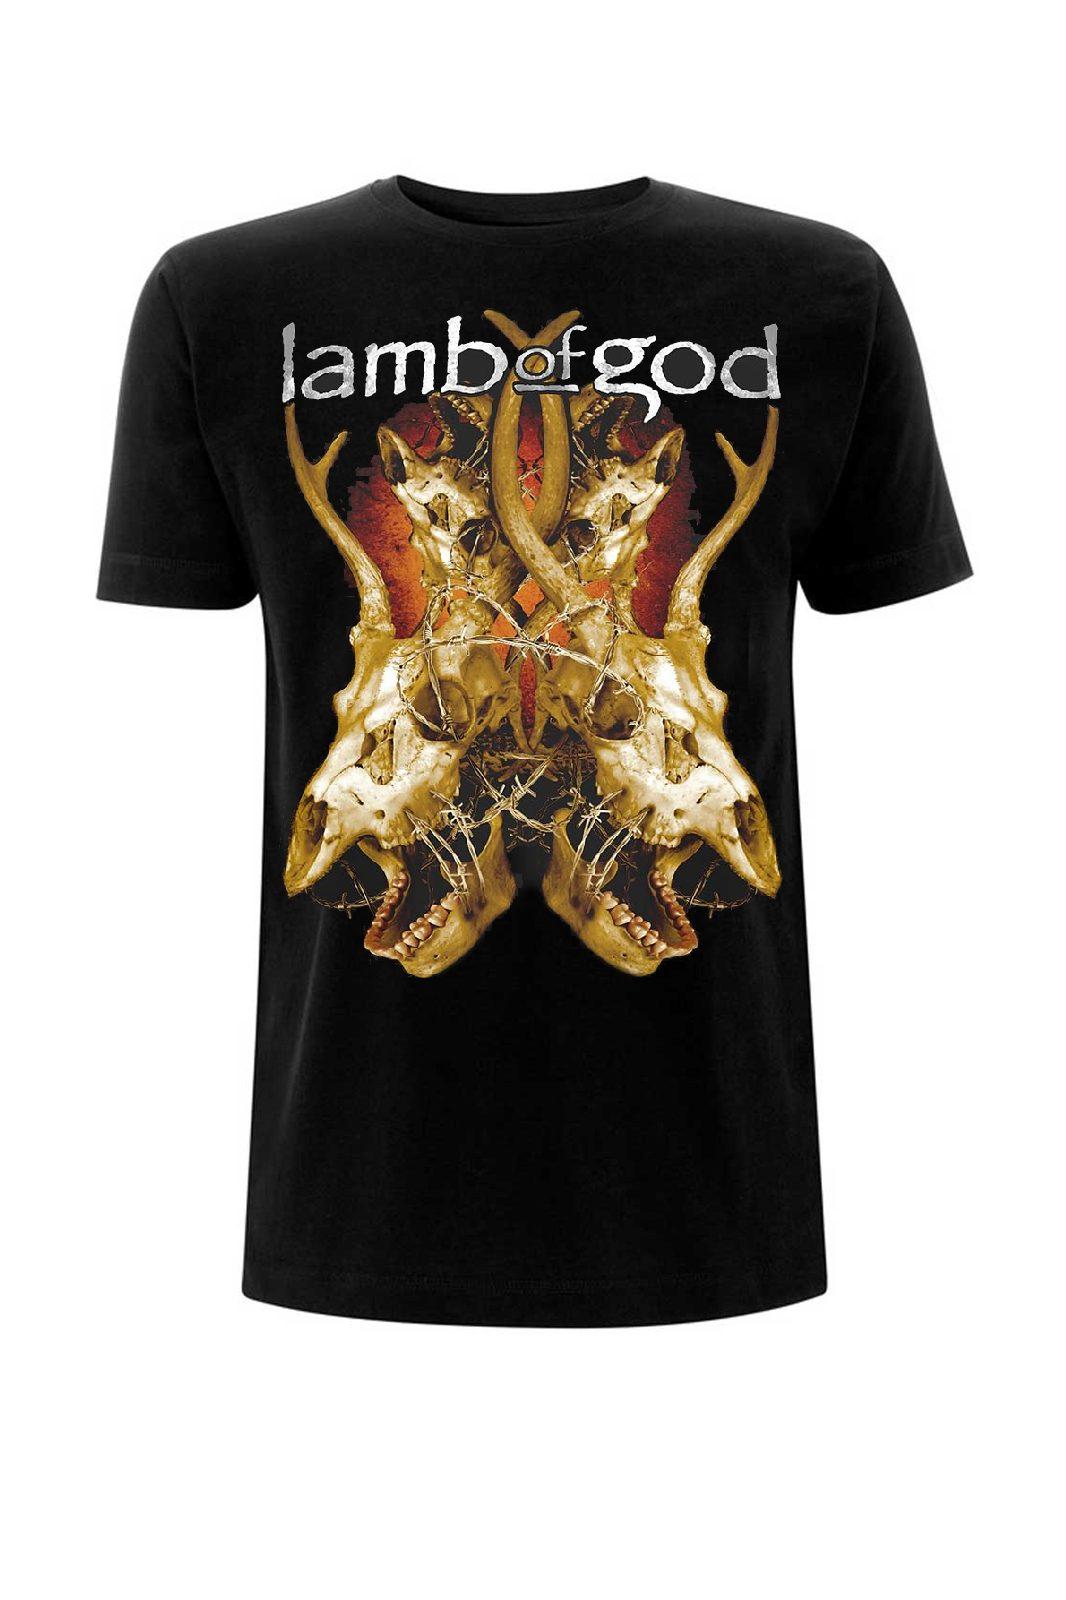 Tee Lamb Of God Tangled Bones Black